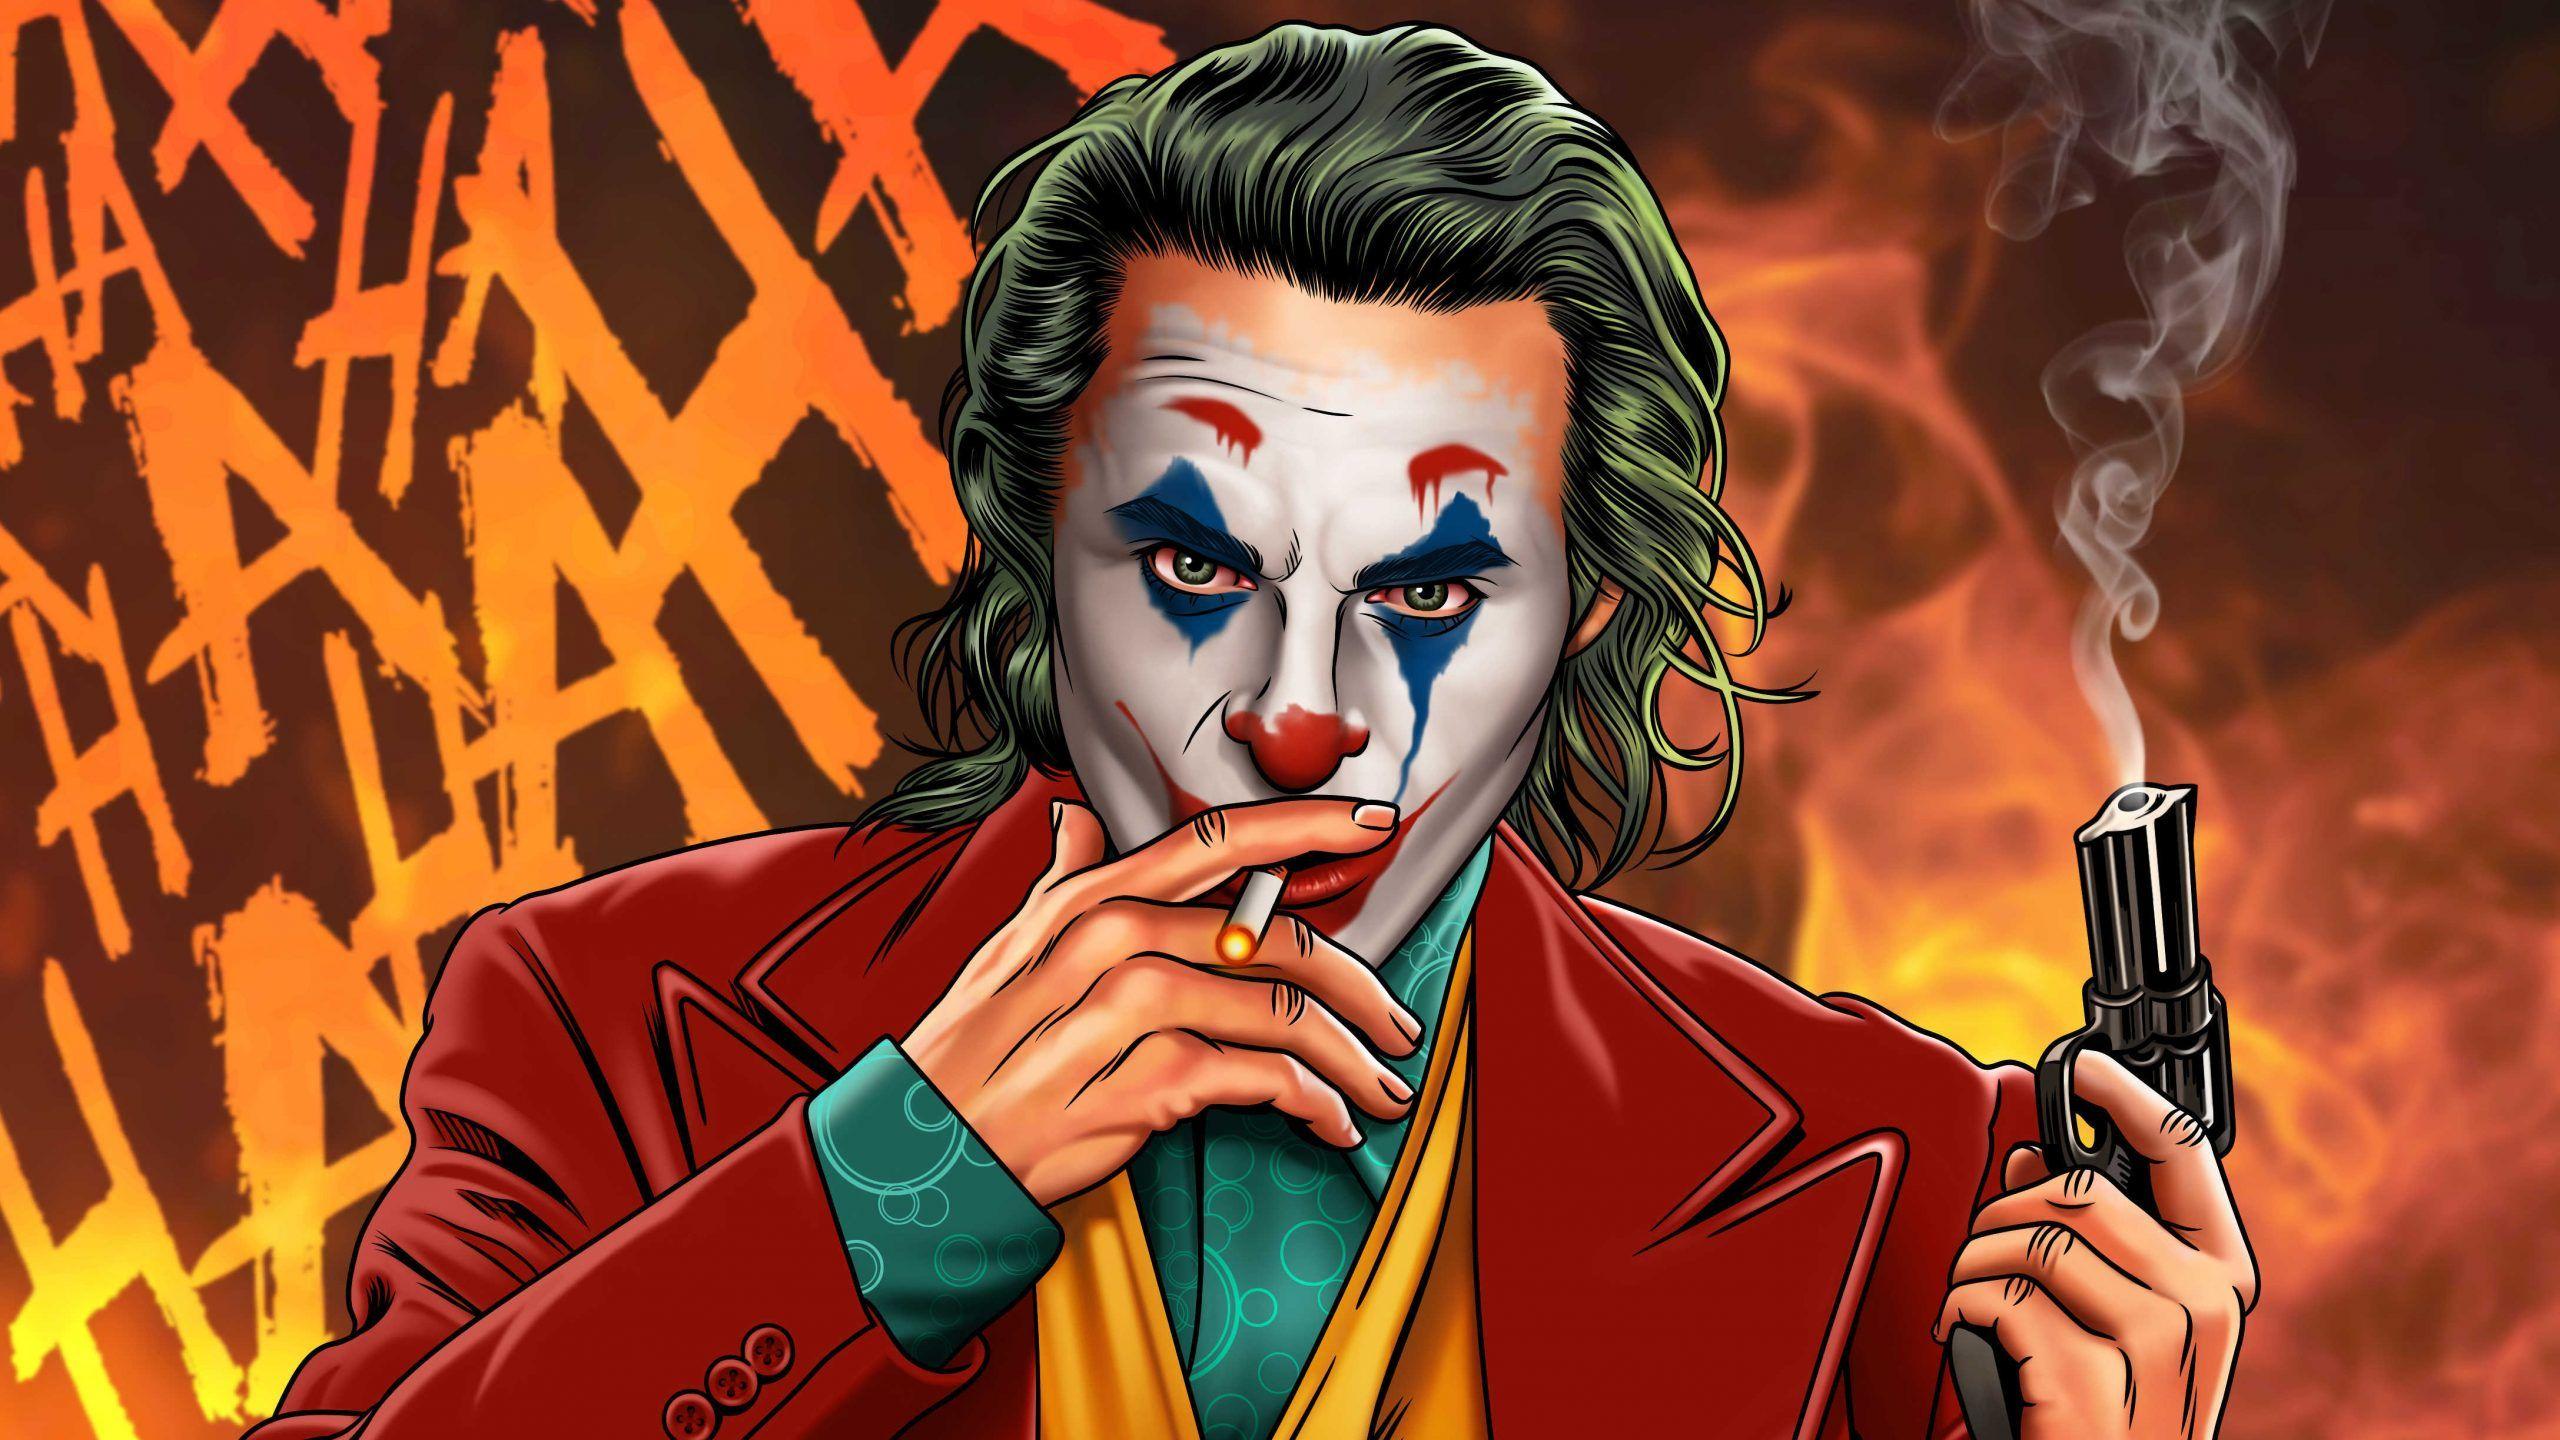 Joker Hd Images 4k Download Wallpaper Joker Hd Wallpaper Batman Joker Wallpaper Joker Images